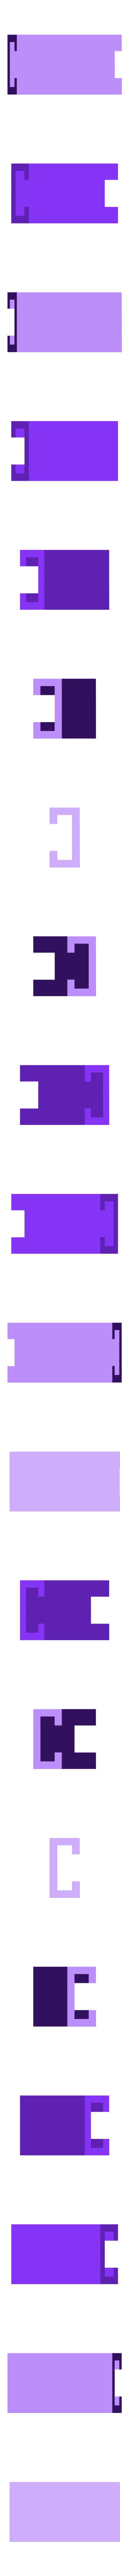 attache.STL Download free STL file Tic Tac Toe • 3D printable design, seb2320